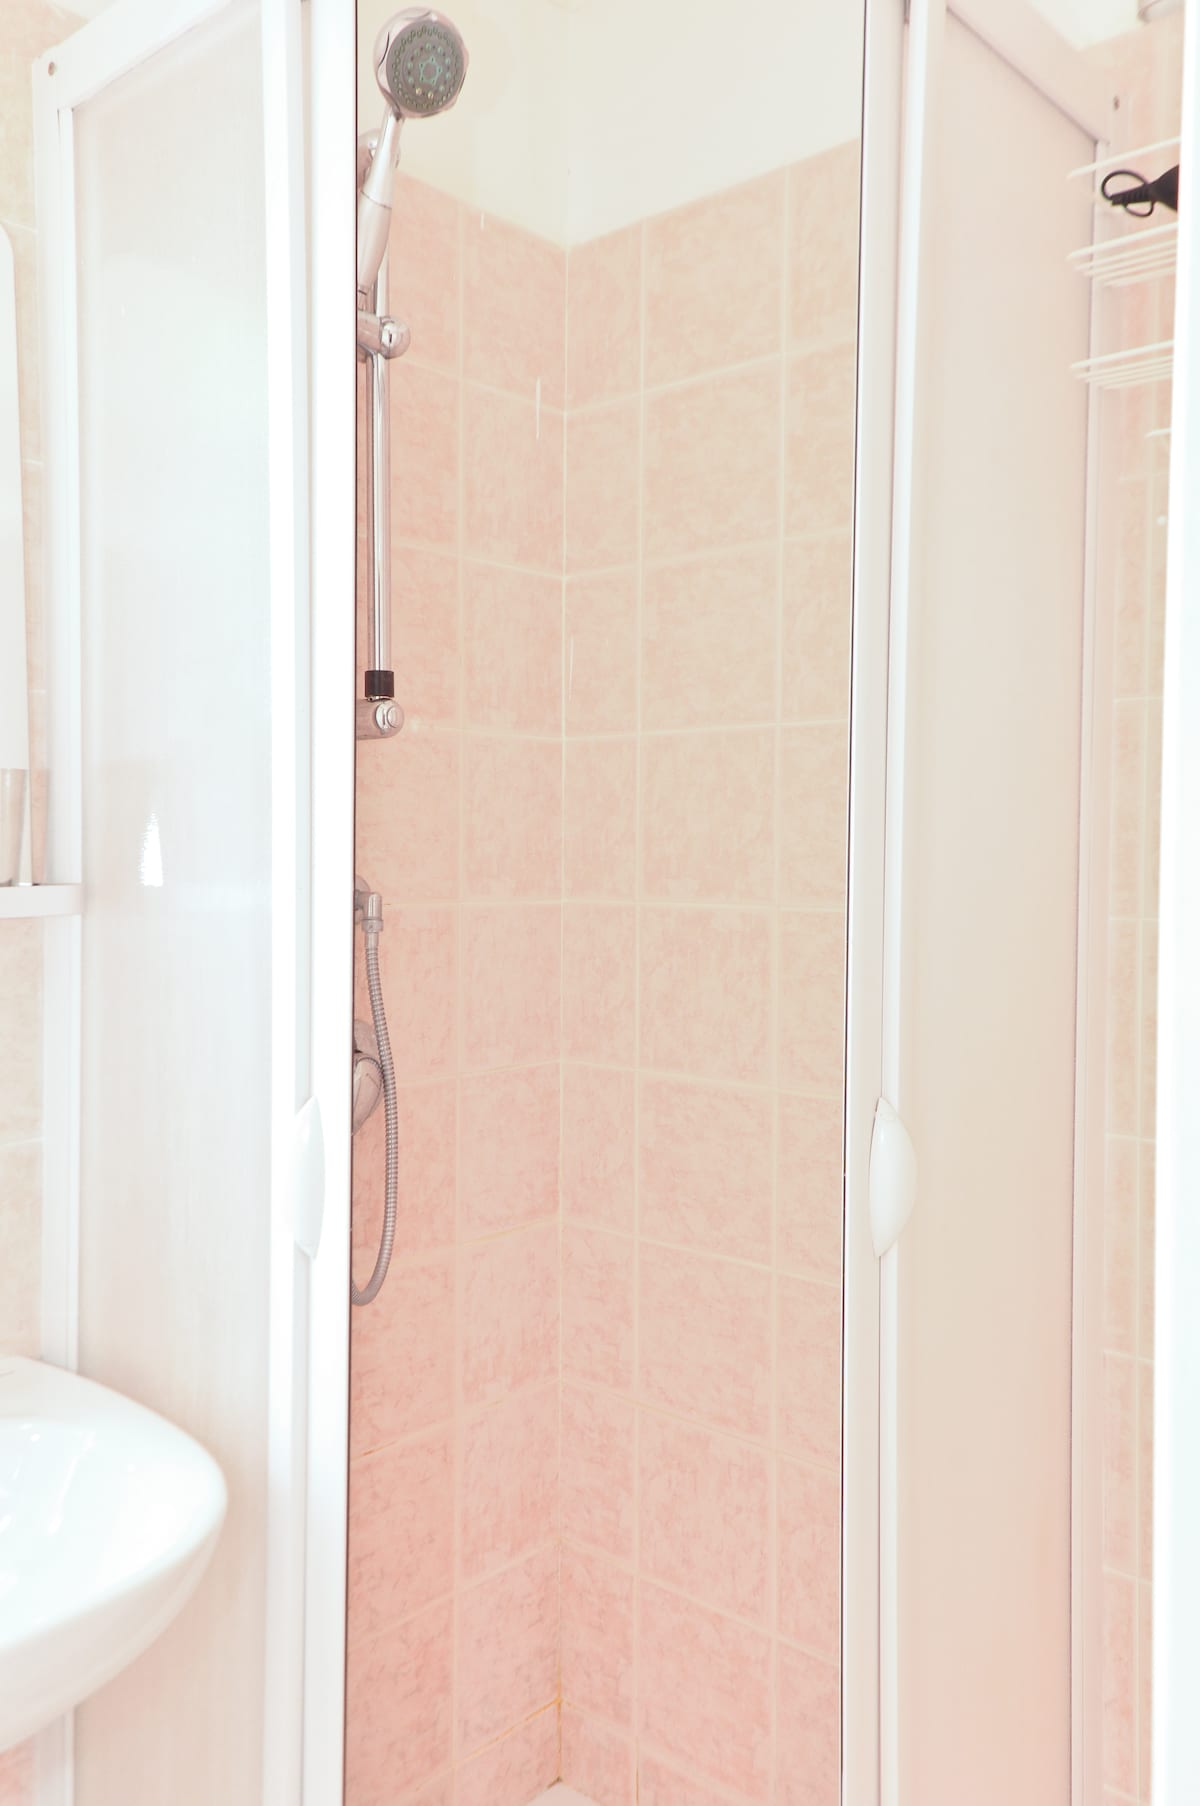 Vespa room with private bathroom